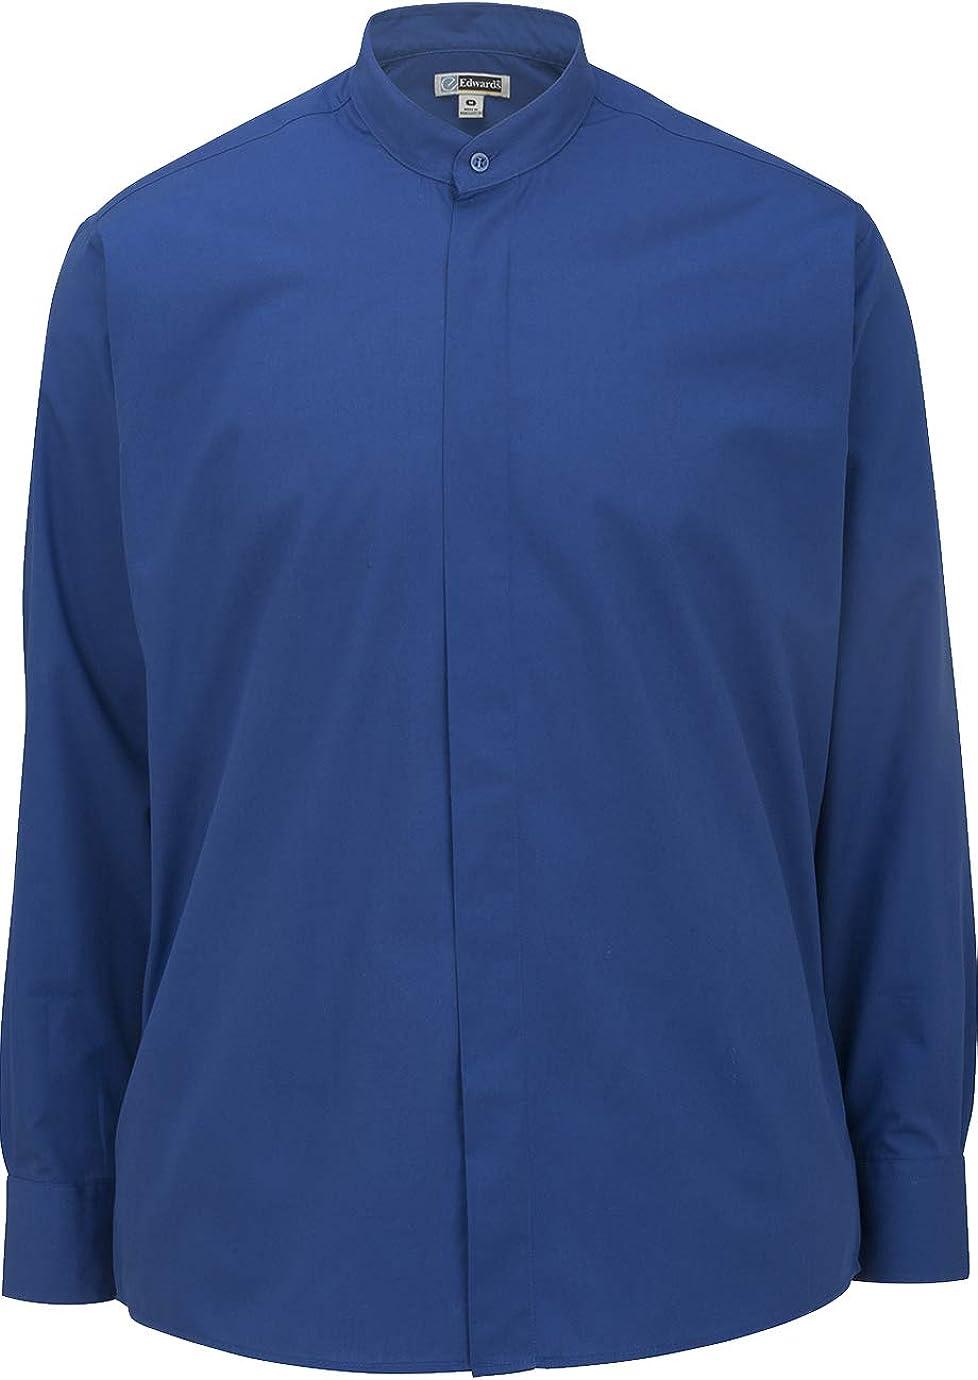 Edwards Men's Banded Collar Shirt